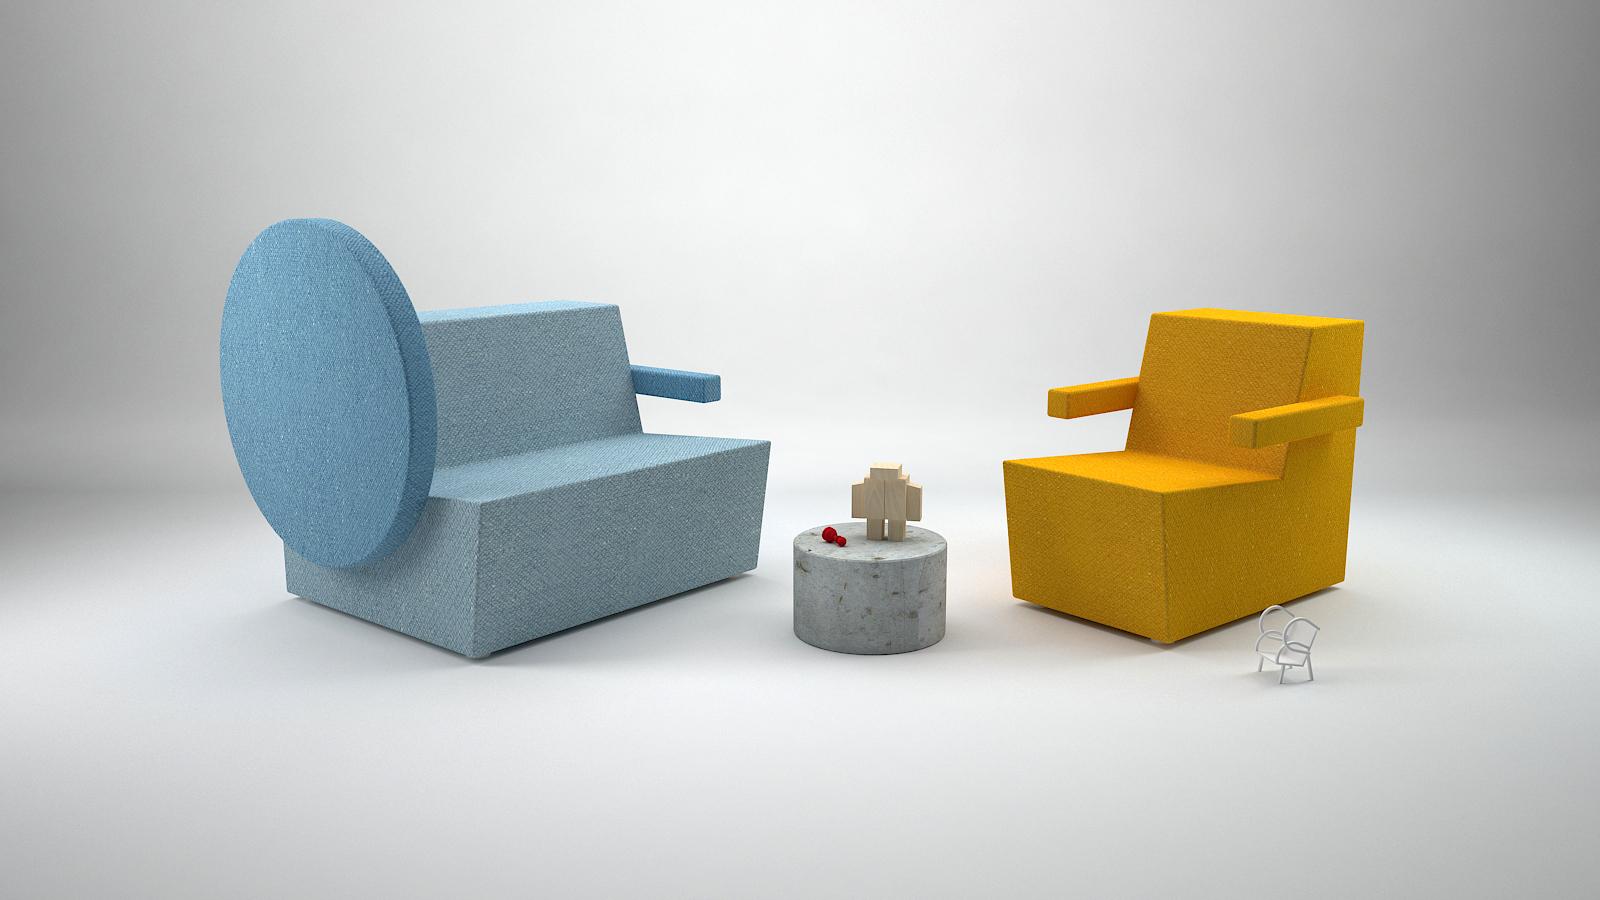 <p>Goodside chair &#8211; roel elsinga</p>